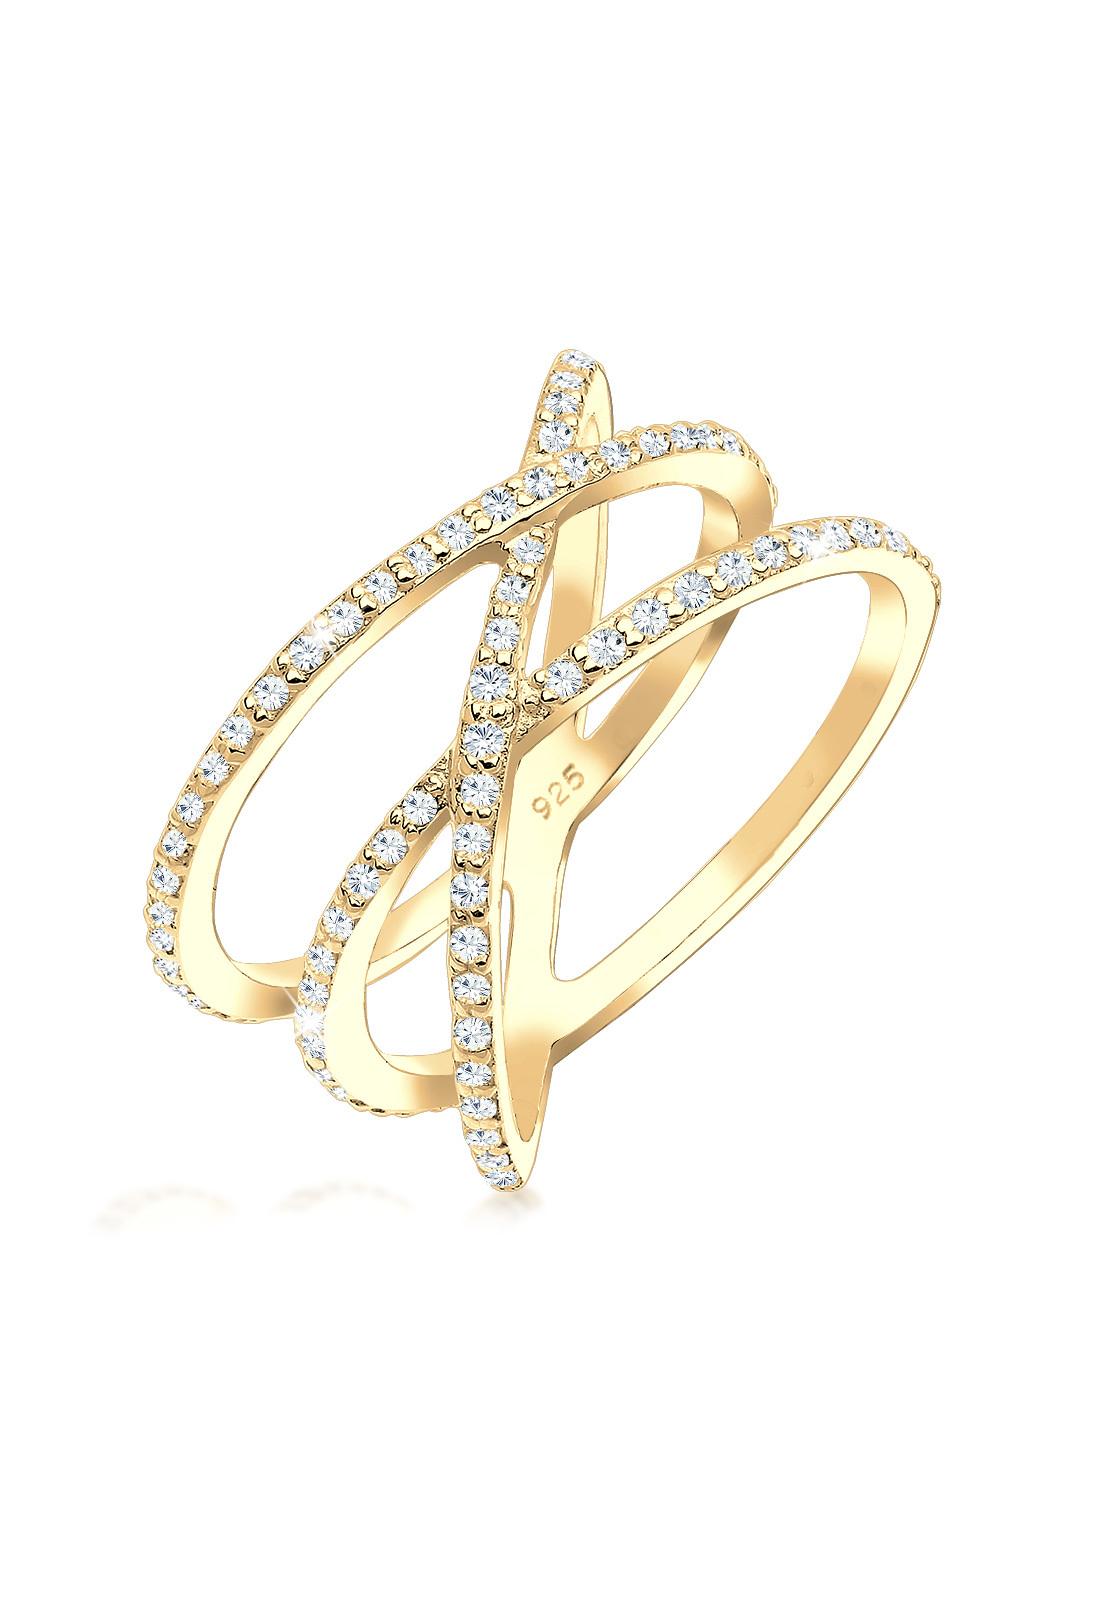 Ring Kreuz   Kristall ( Weiß )   925 Sterling Silber vergoldet